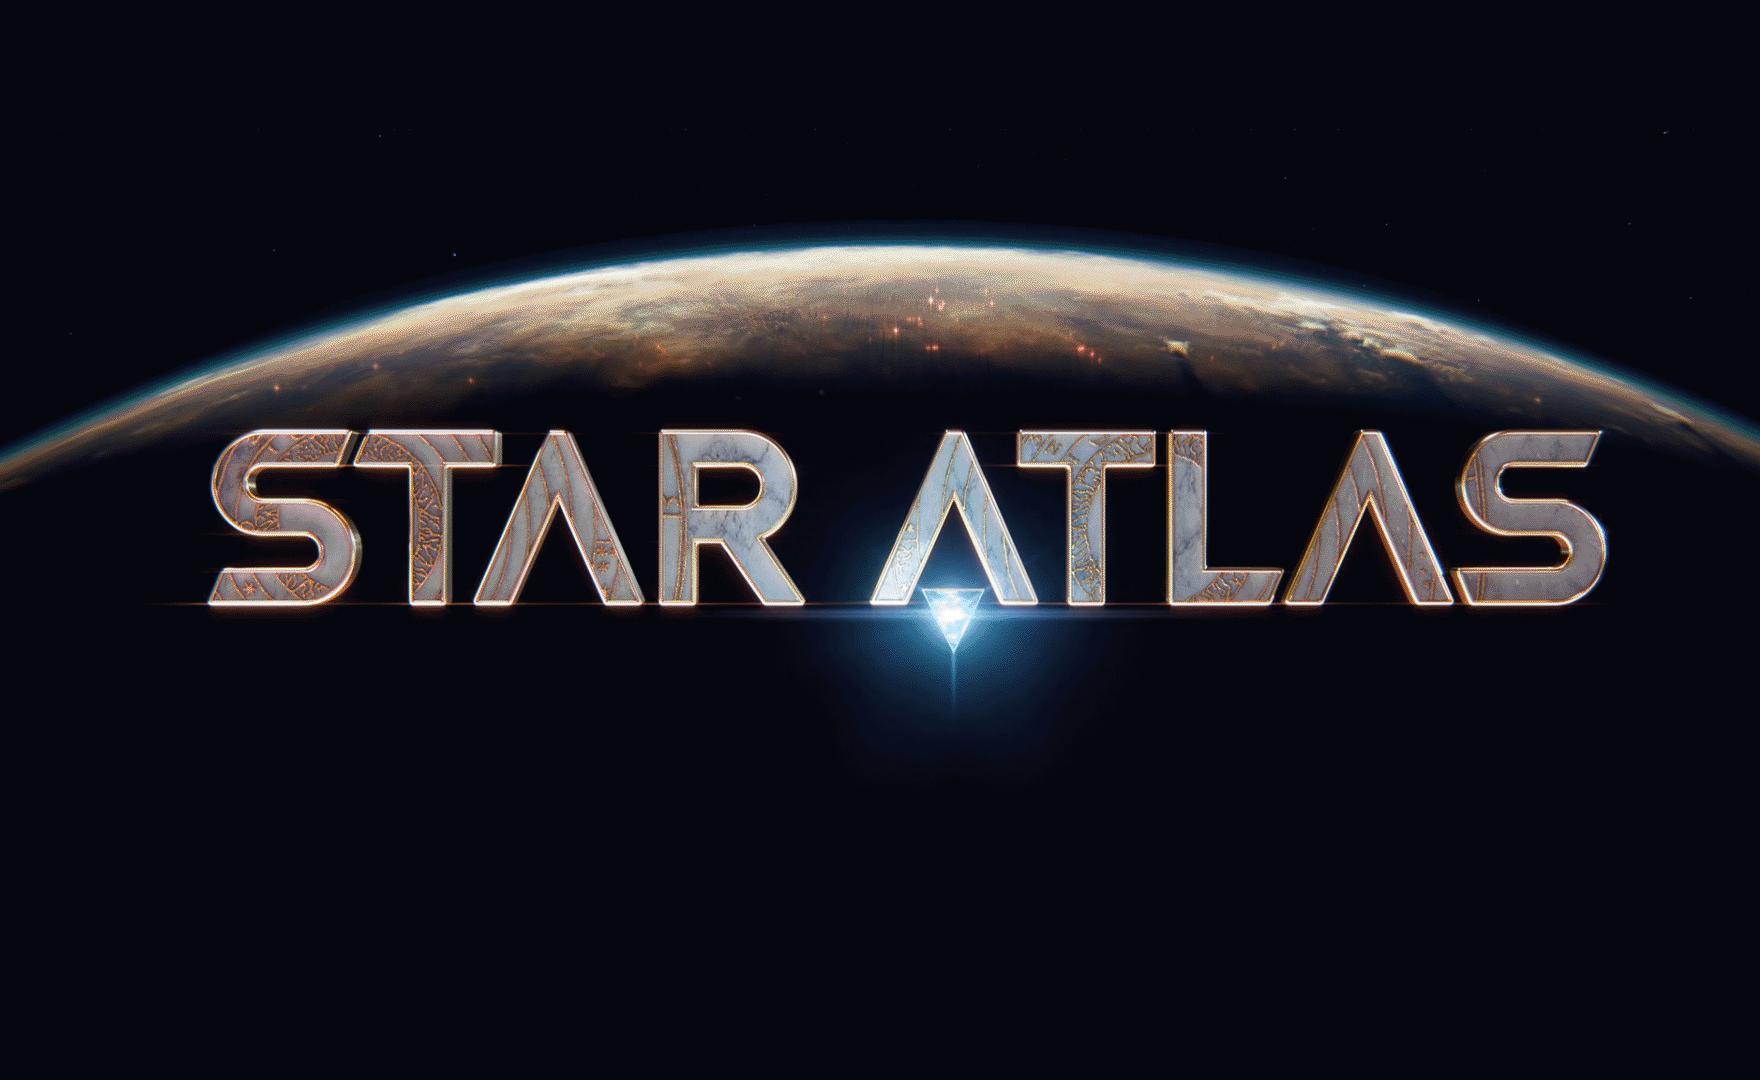 STAR ATLAS CINEMATIC TRAILER